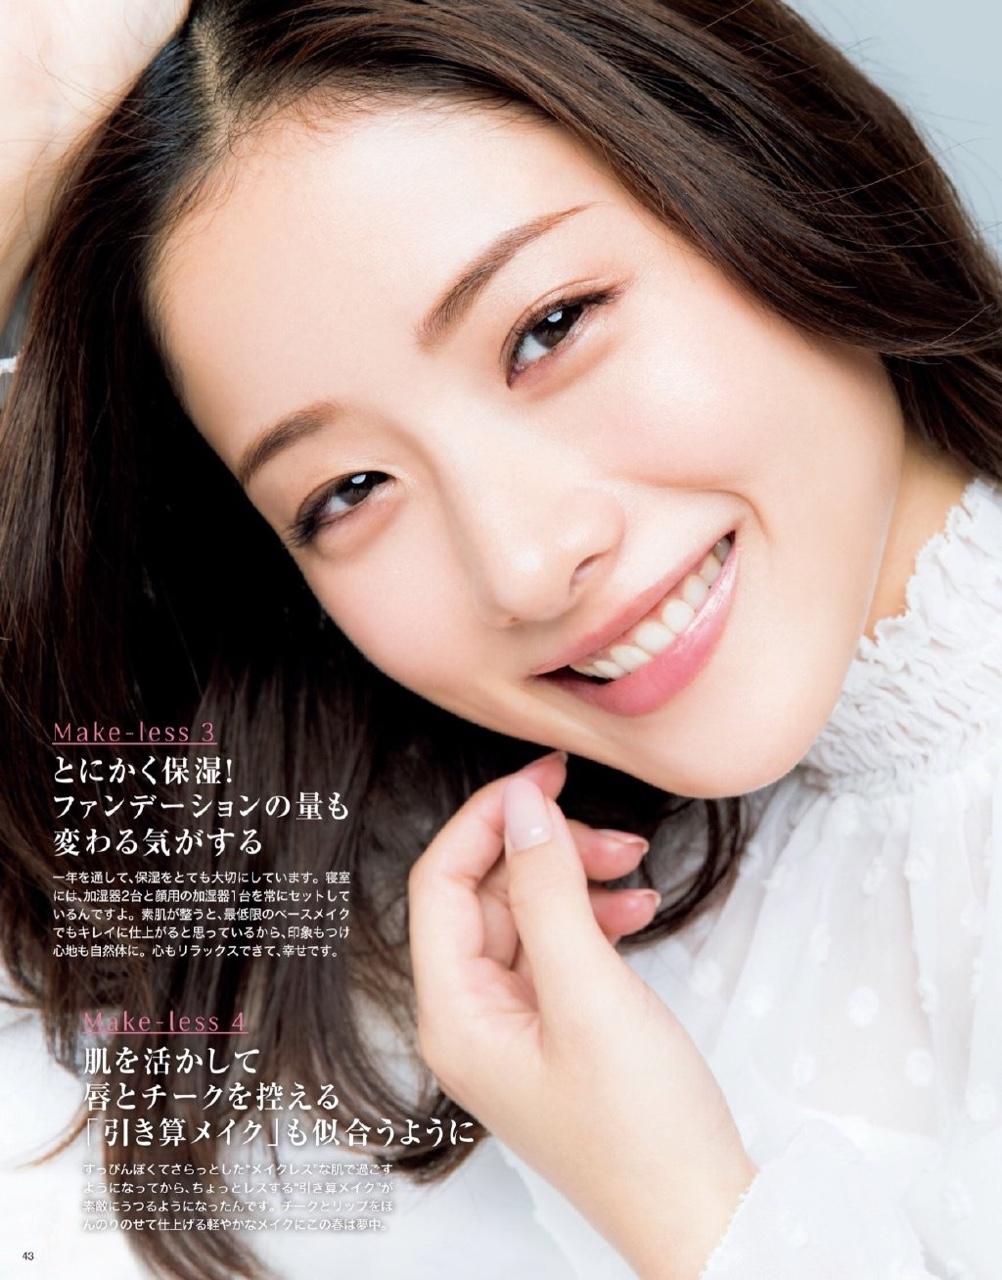 IshiharaSatomiMaquia8.jpg